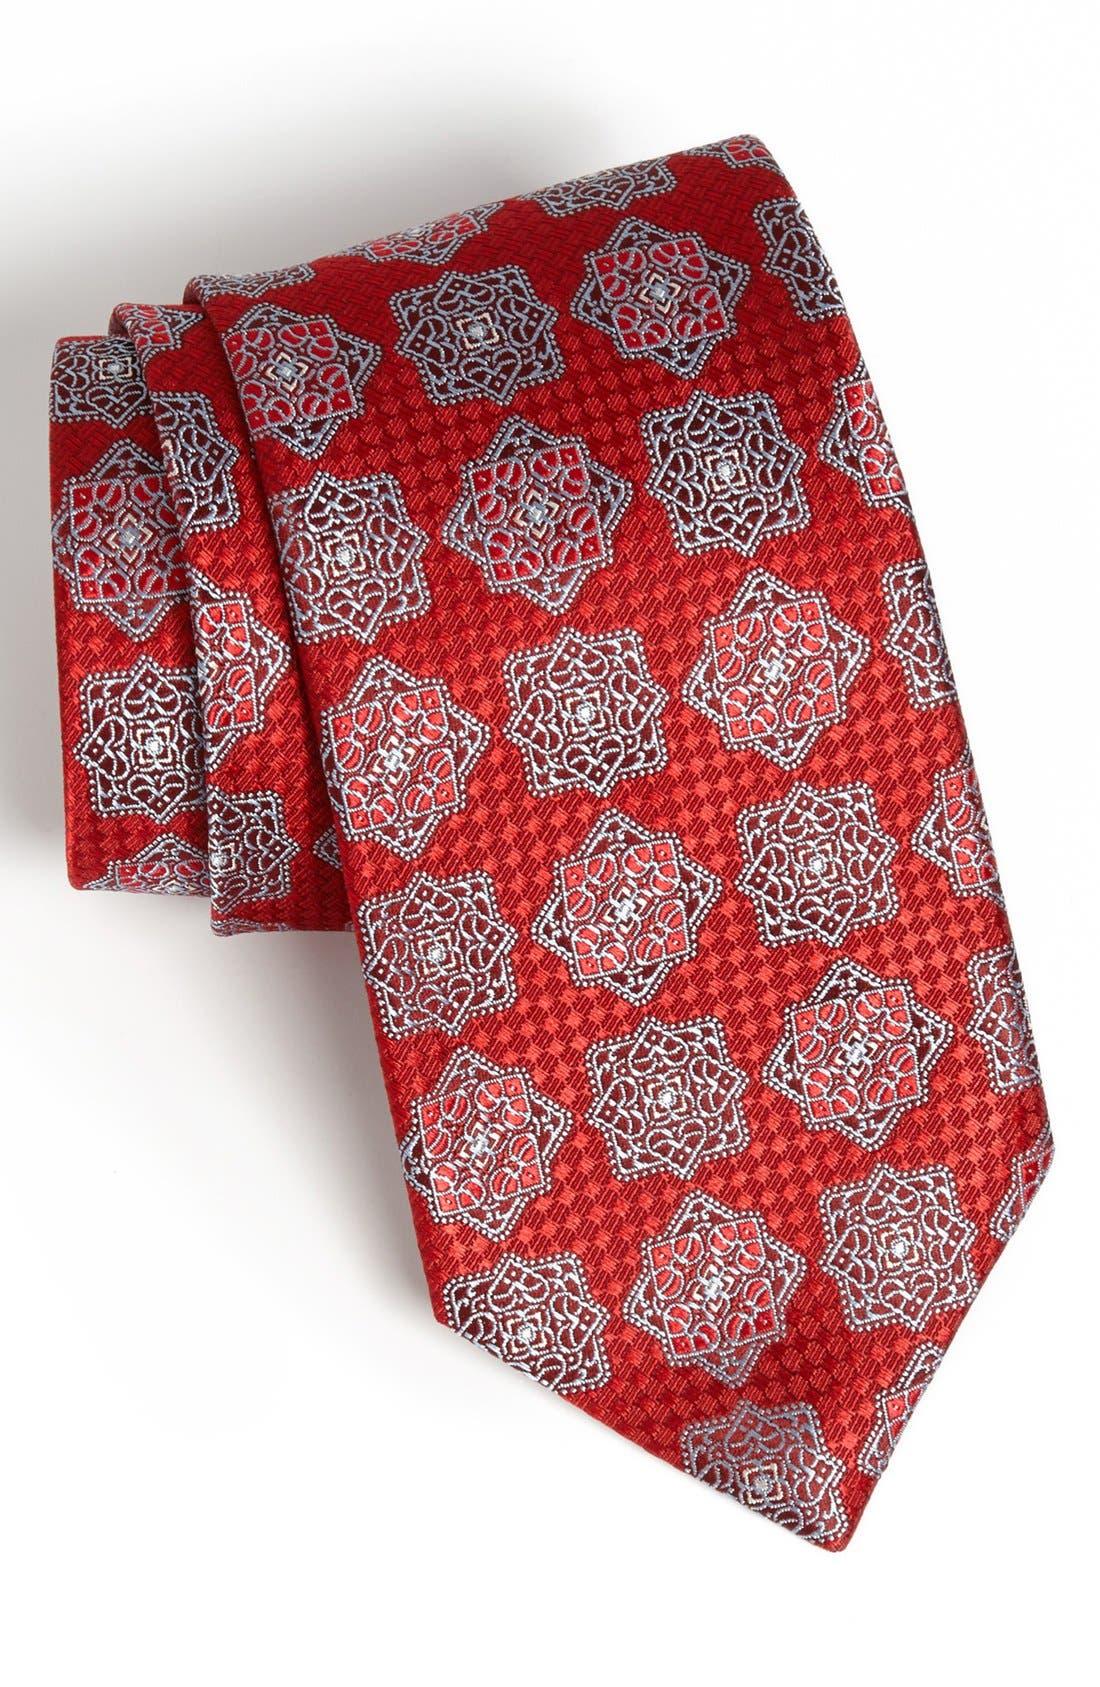 Alternate Image 1 Selected - David Donahue Woven Silk Tie